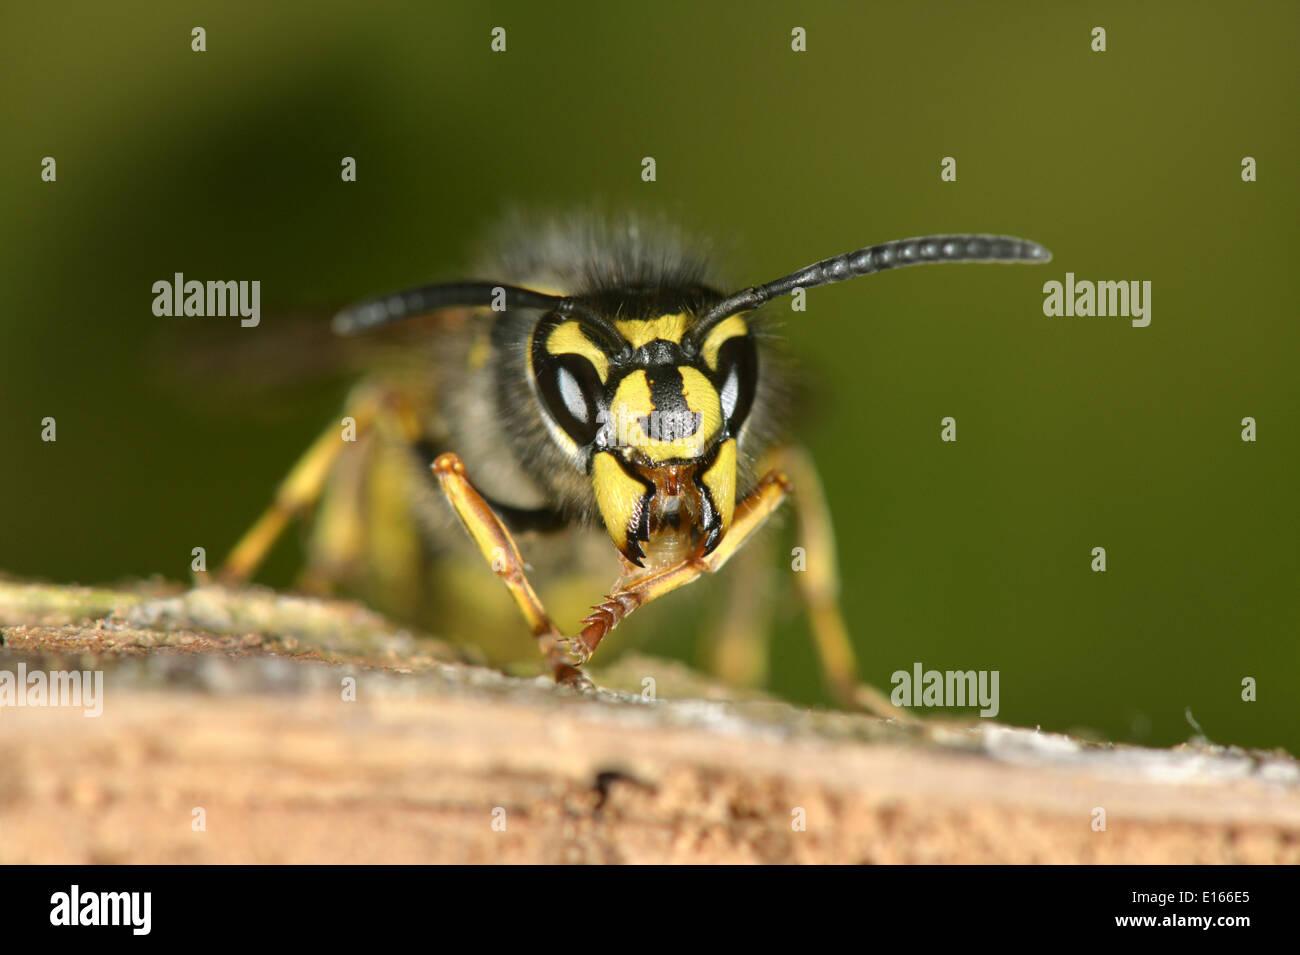 Common Wasp - Vespula vulgaris - Stock Image